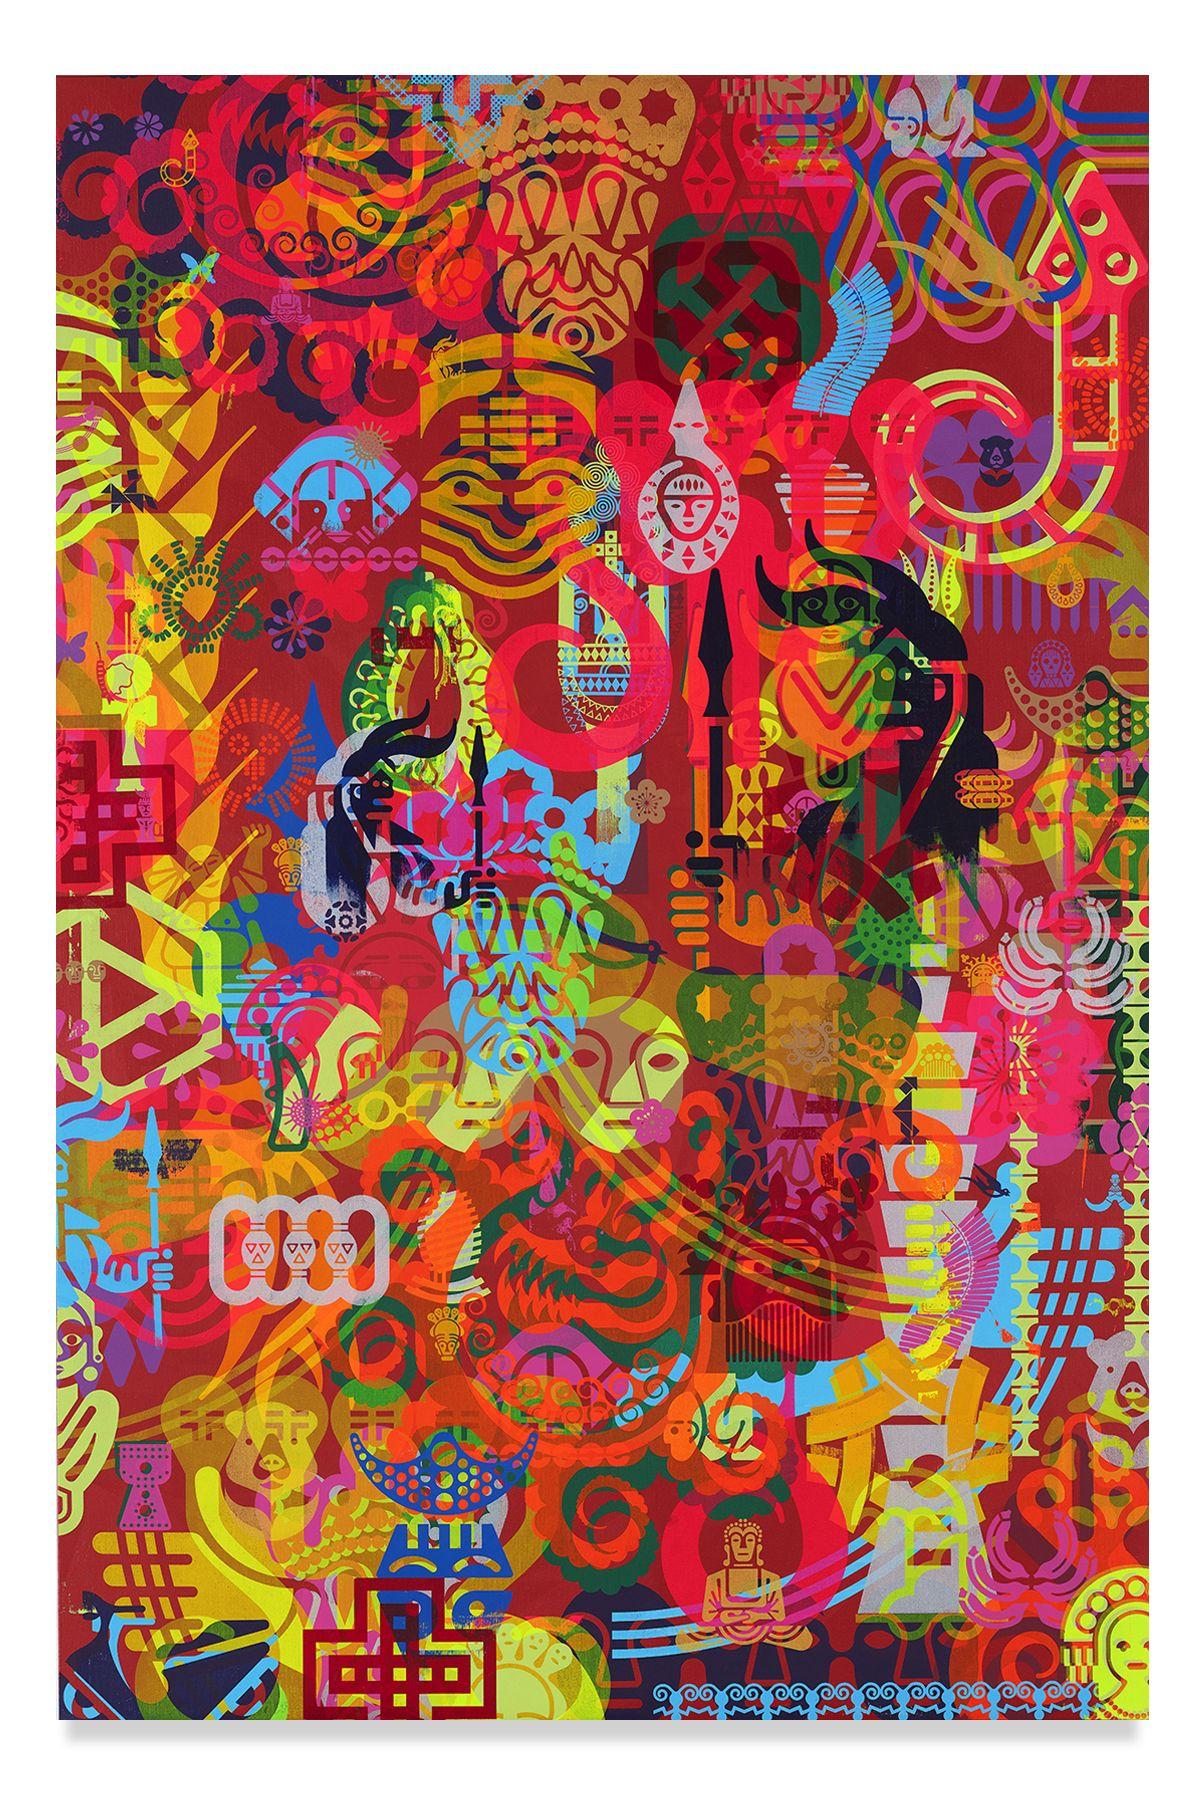 Taipei Dangdai 4, 2019,Acrylic on linen,60 x 40 inches,152.4 x 101.6 cm,MMG#31810